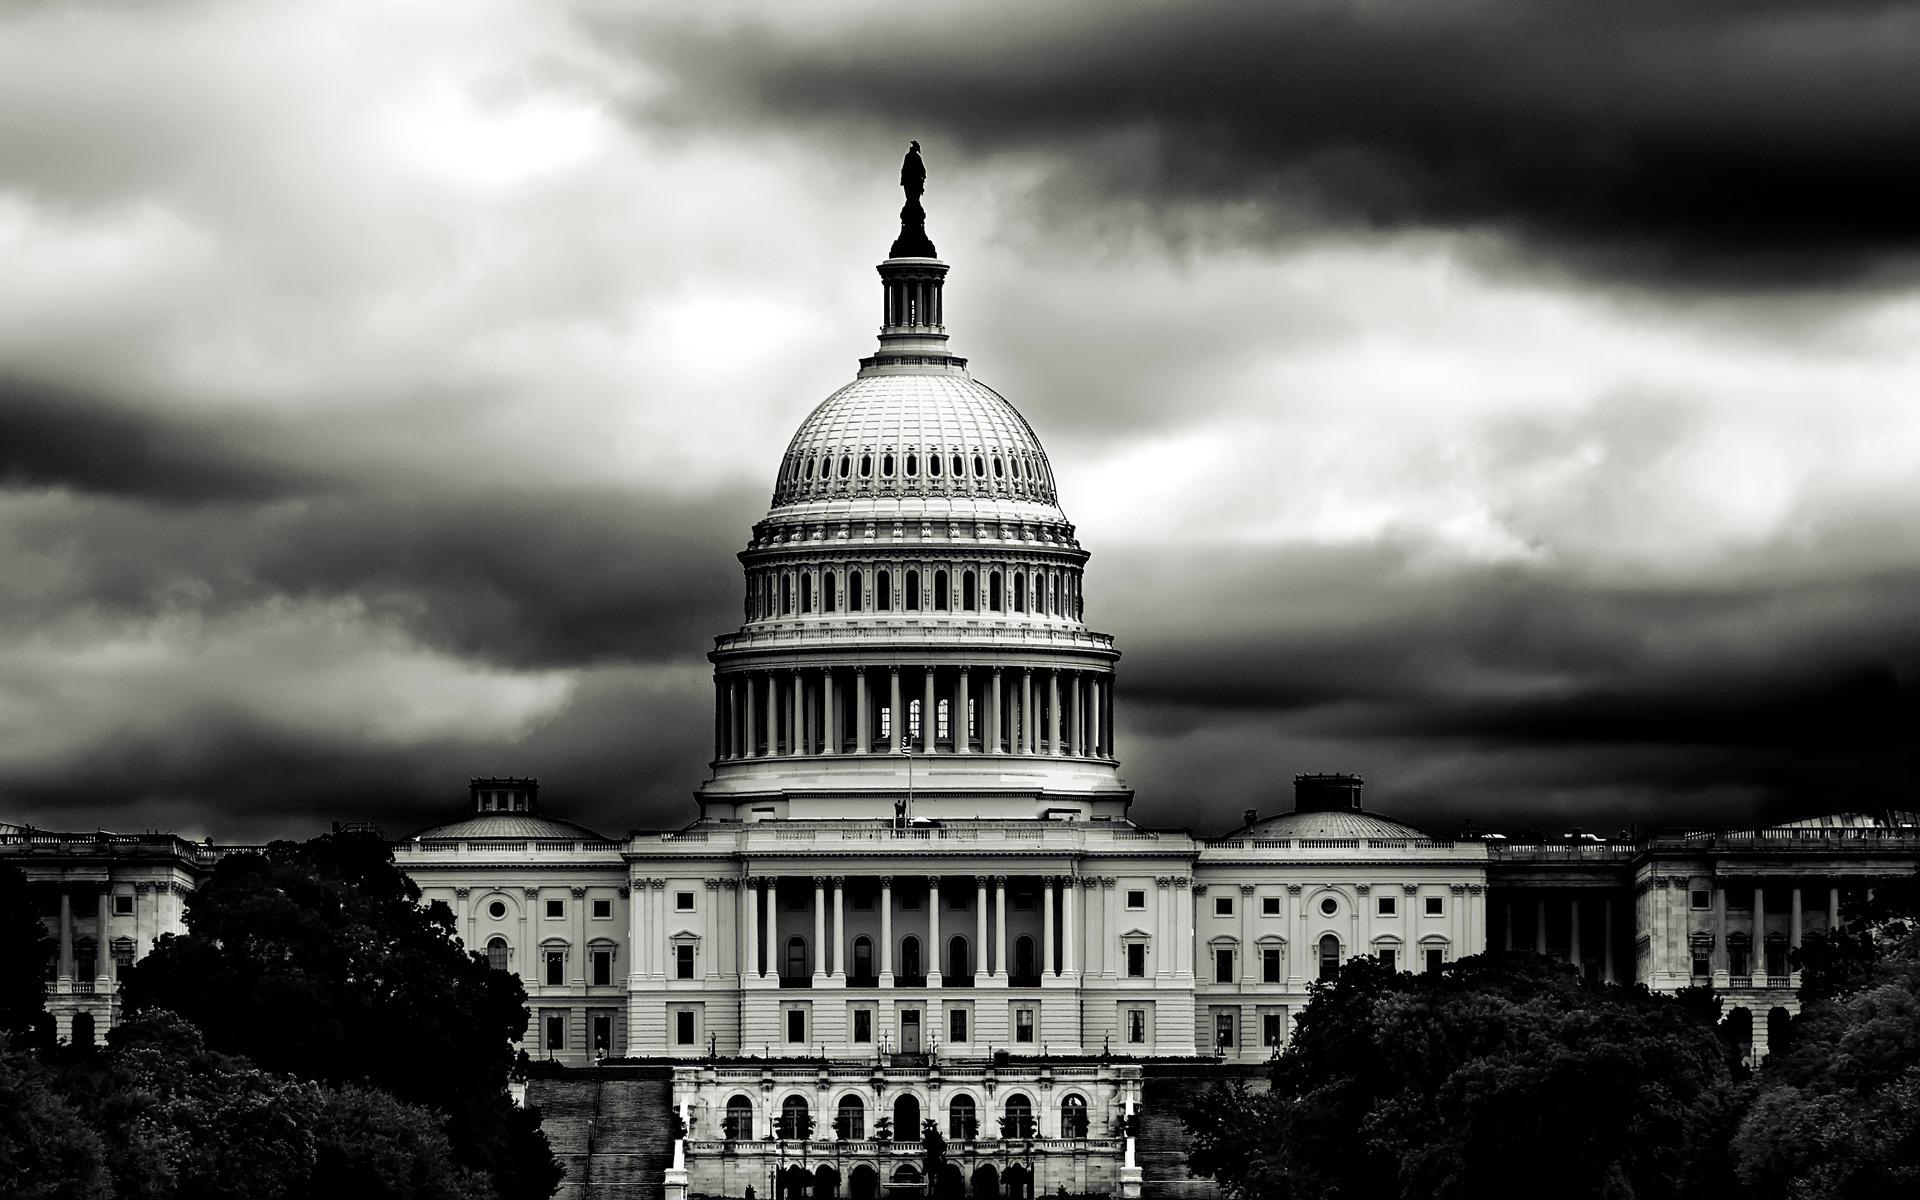 The United States Capitol Washington DC Wallpaper – 1920 x 1200 pixels – 589 kB